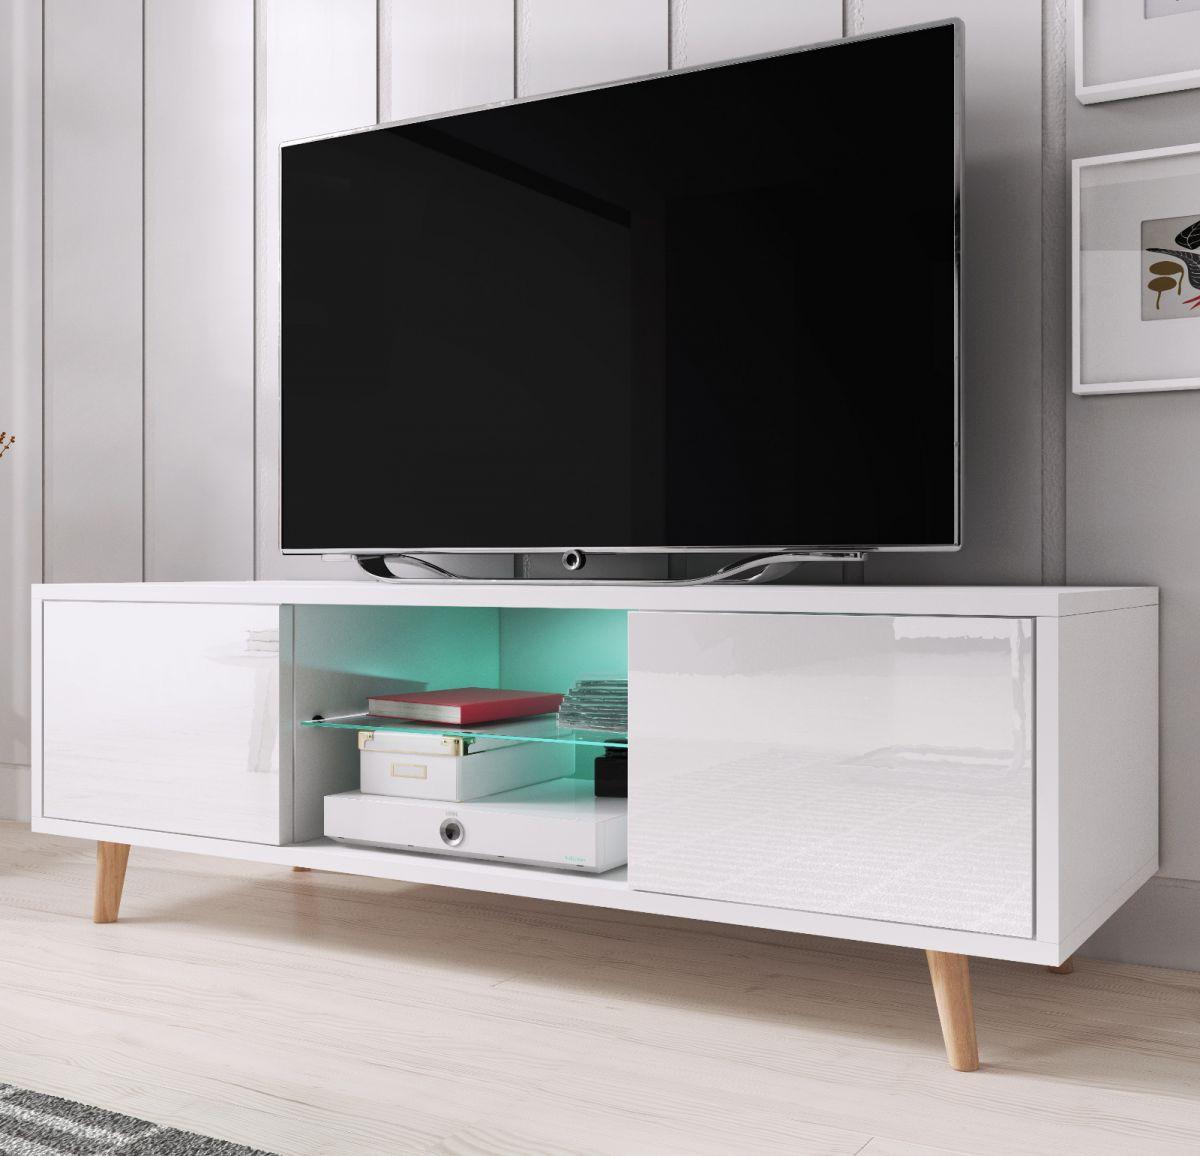 TV-Lowboard Norway-1 Hochglanz weiss 140 cm